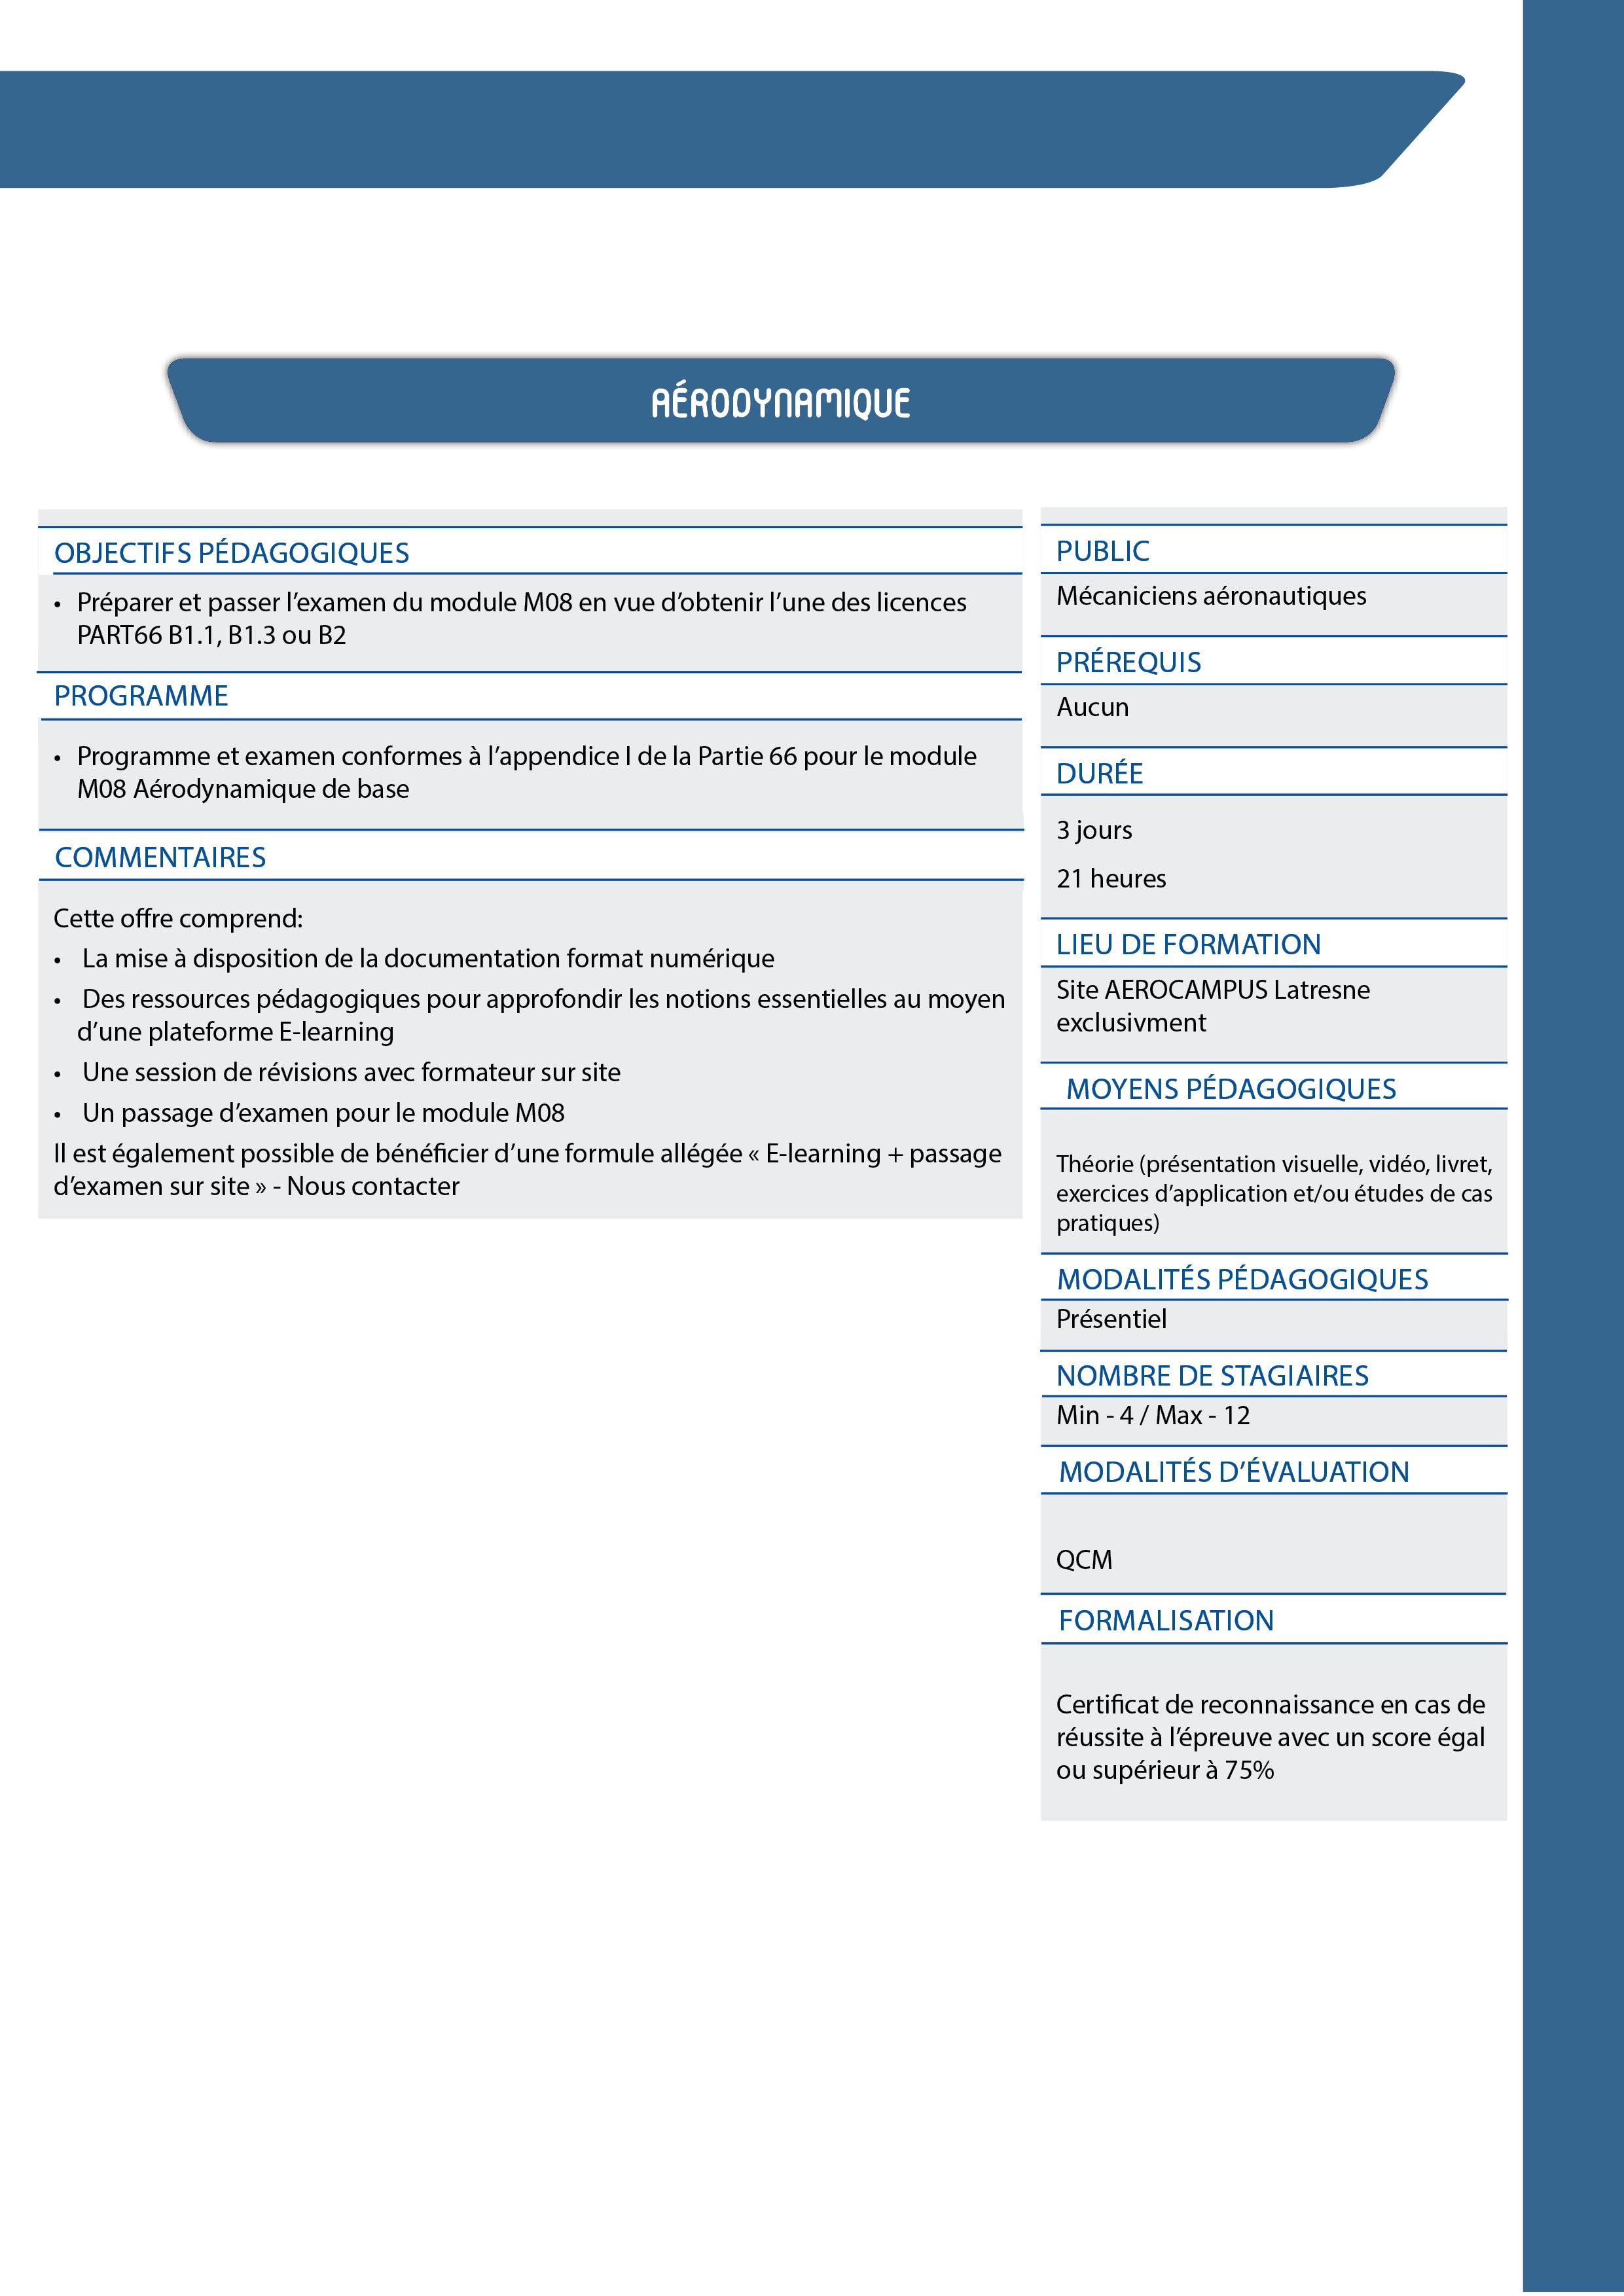 CATALOGUE FORMATIONS CONTINUES AEROCAMPUS_Ed2020_HD63